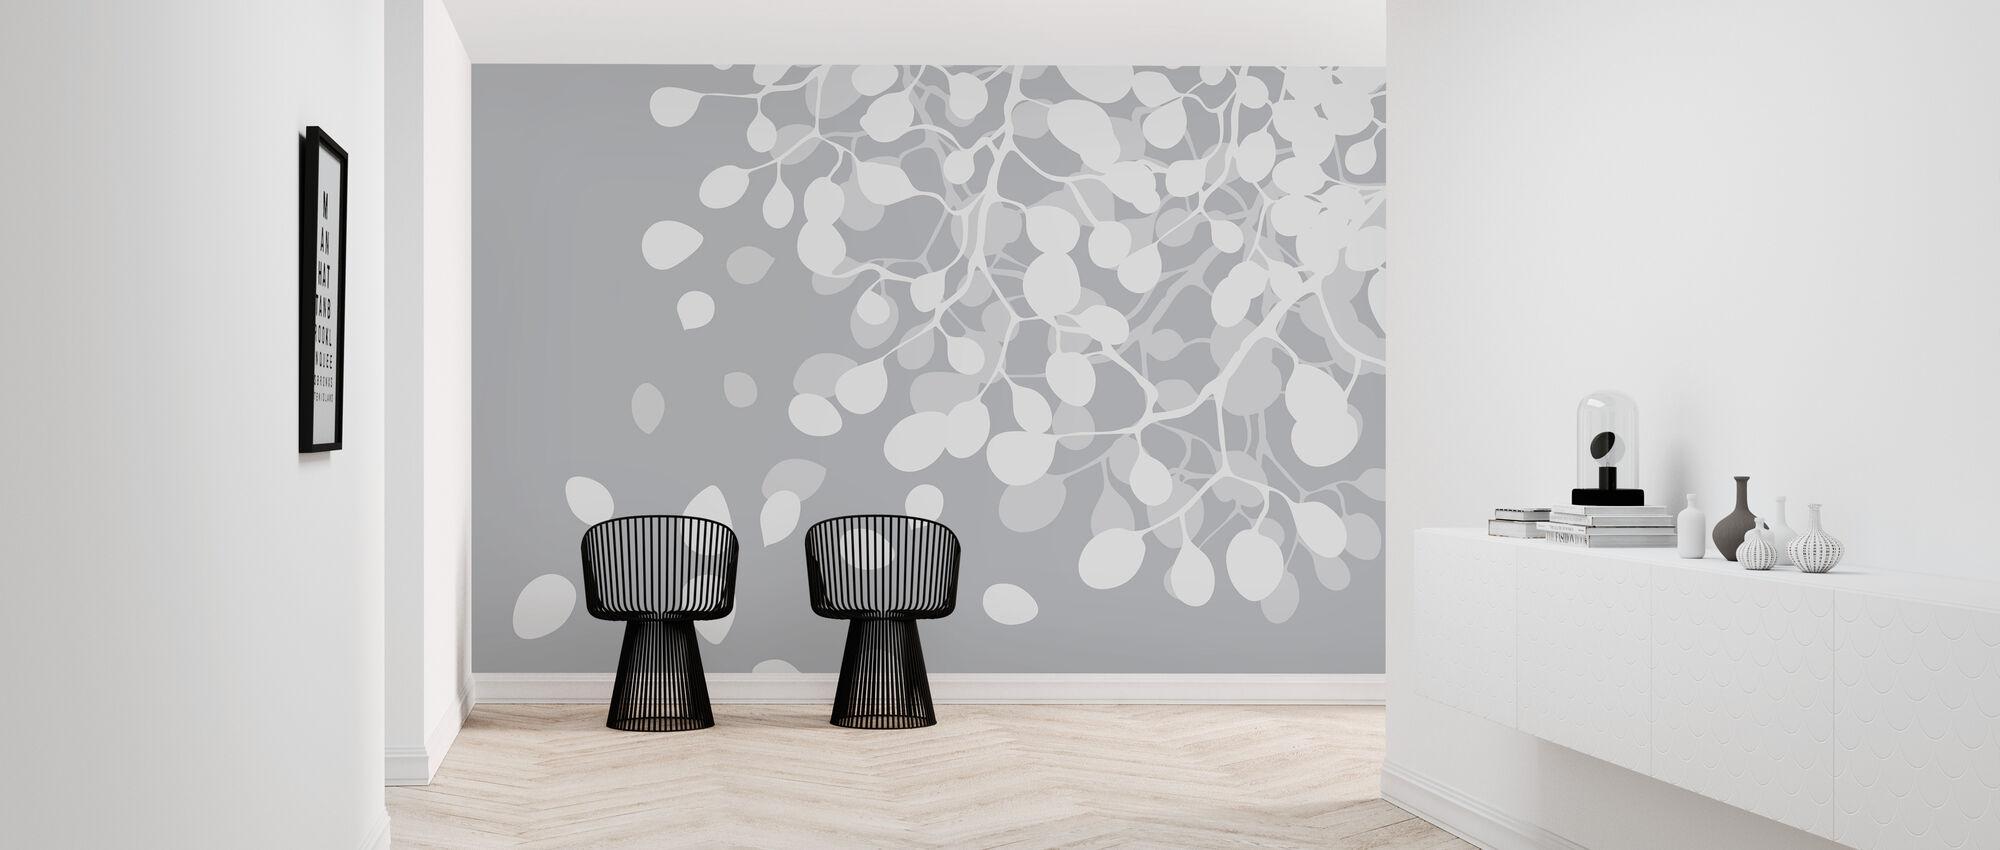 Birch Asphalt - Wallpaper - Hallway